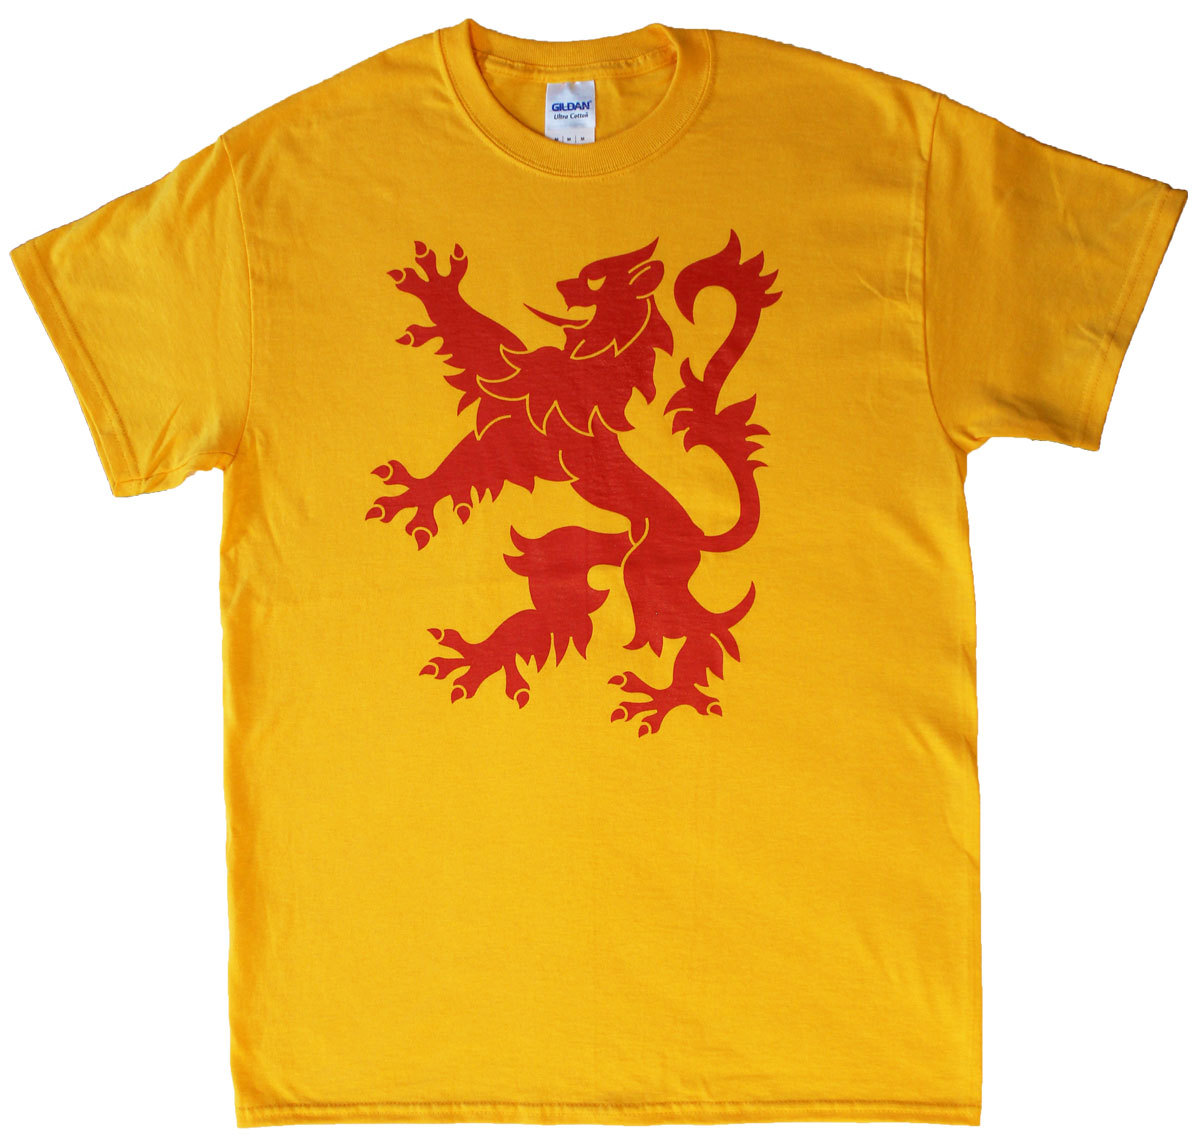 Scotland lion t shirt 3